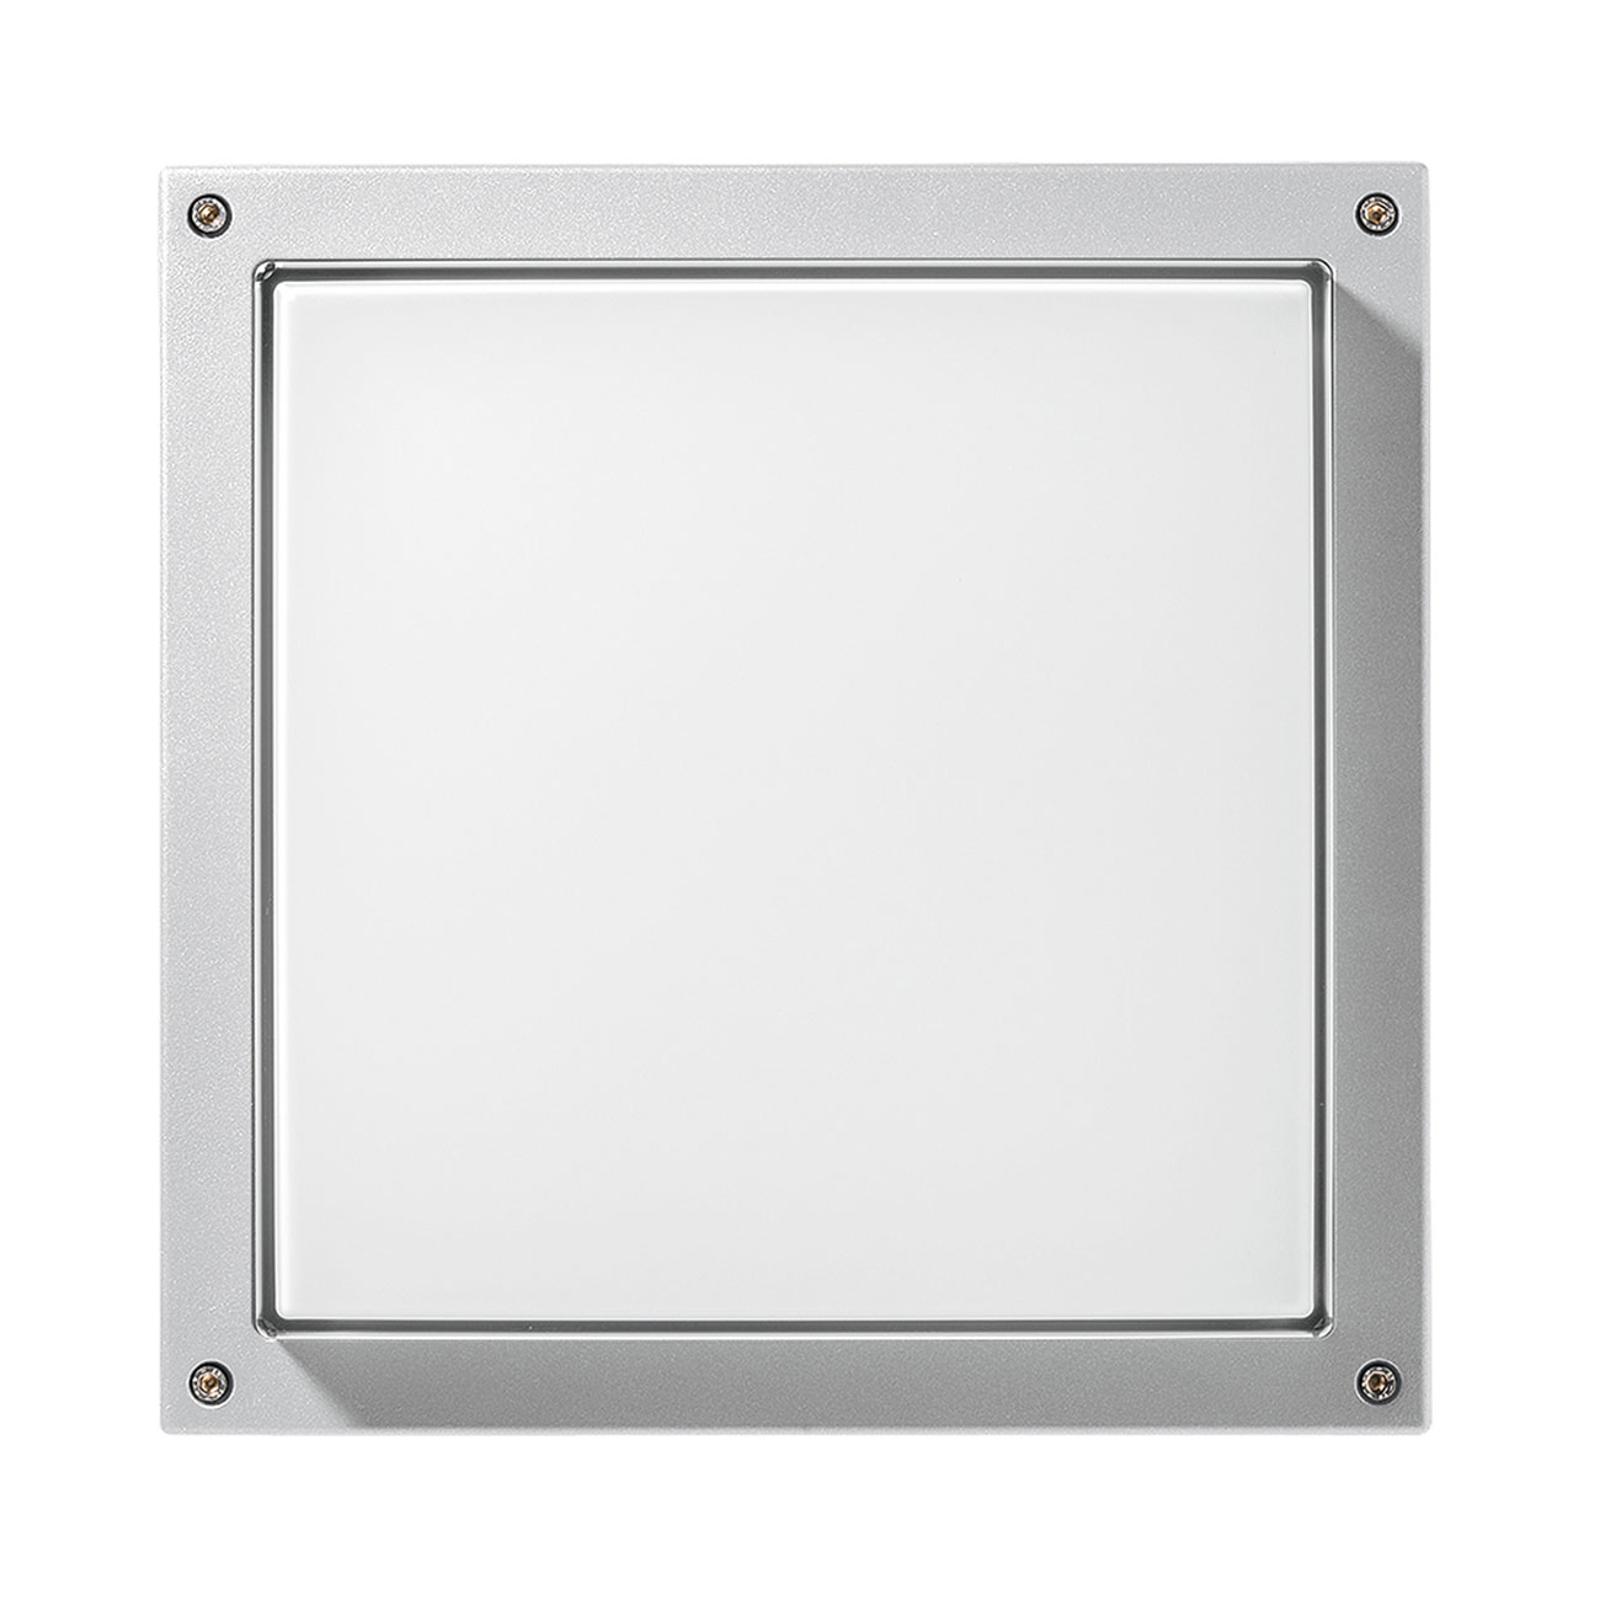 Wandlamp Bliz Square 40 3.000K wit dimbaar